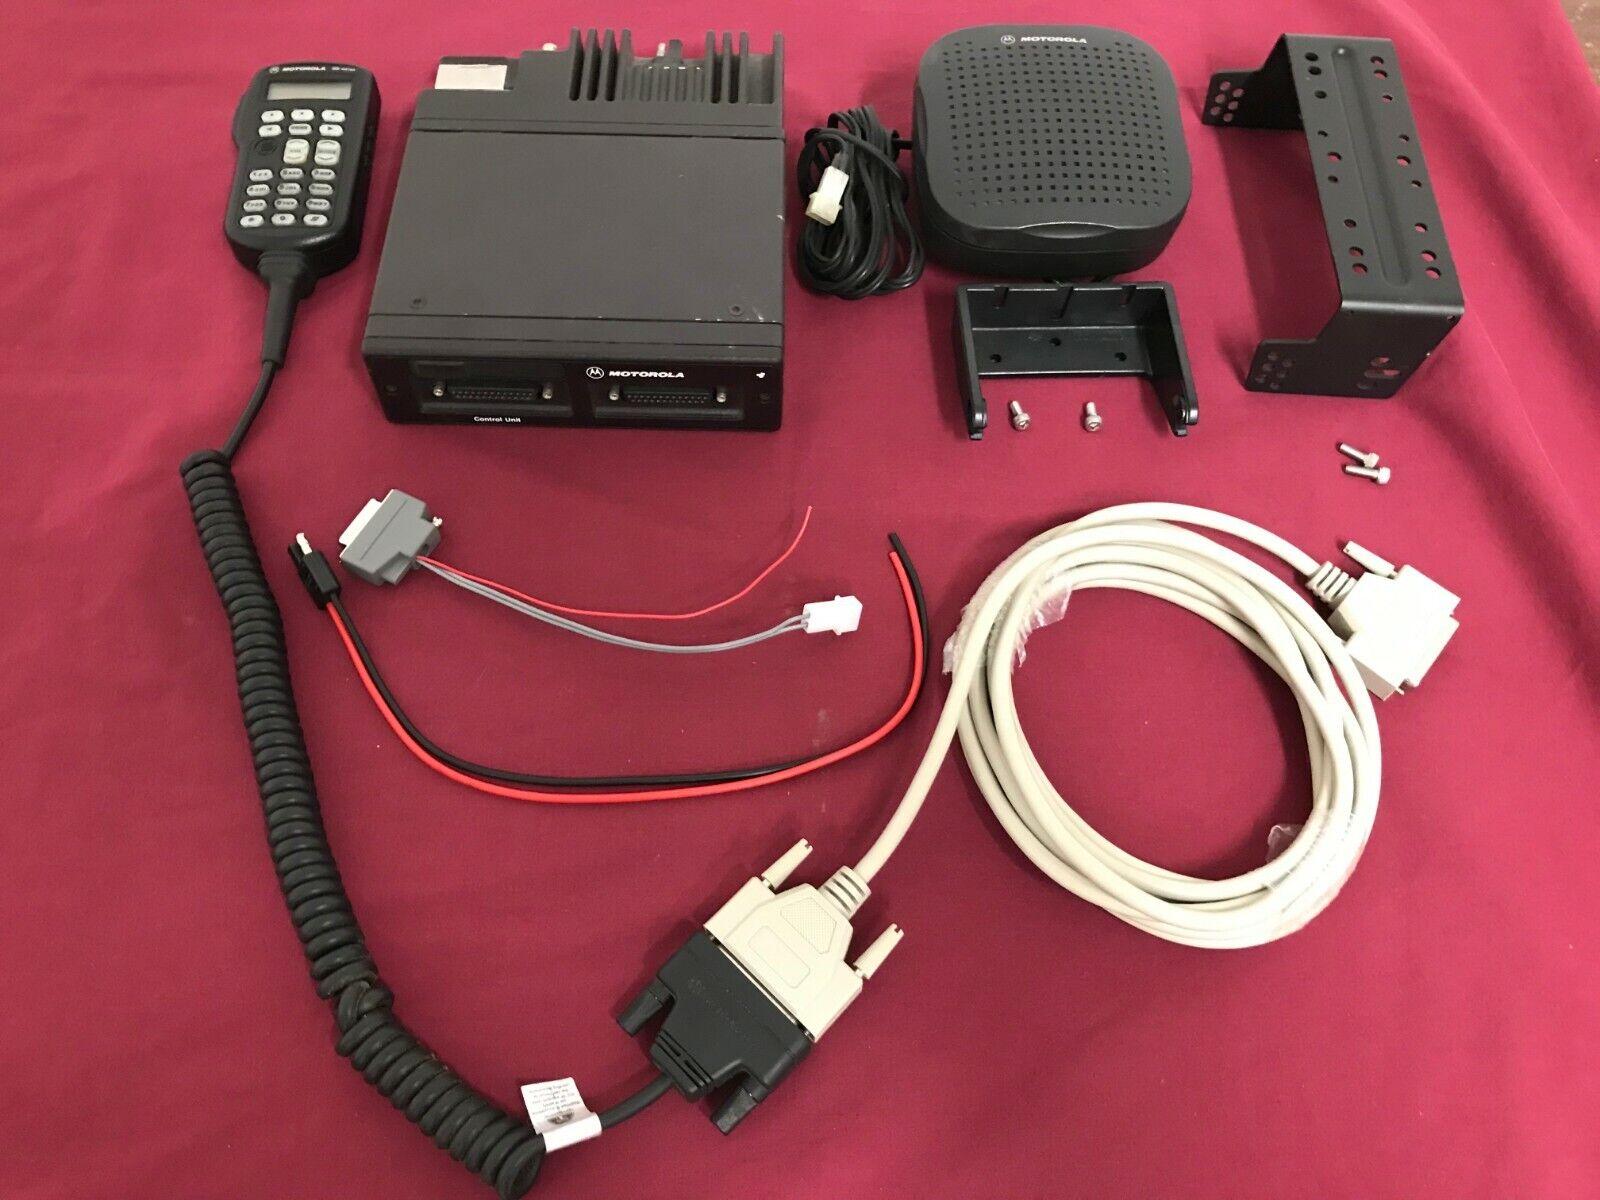 UPGRADED MOTOROLA ASTRO SPECTRA W3 VHF P25 DIGITAL MOBILE RADIO 50 WATT - HAM. Buy it now for 271.99